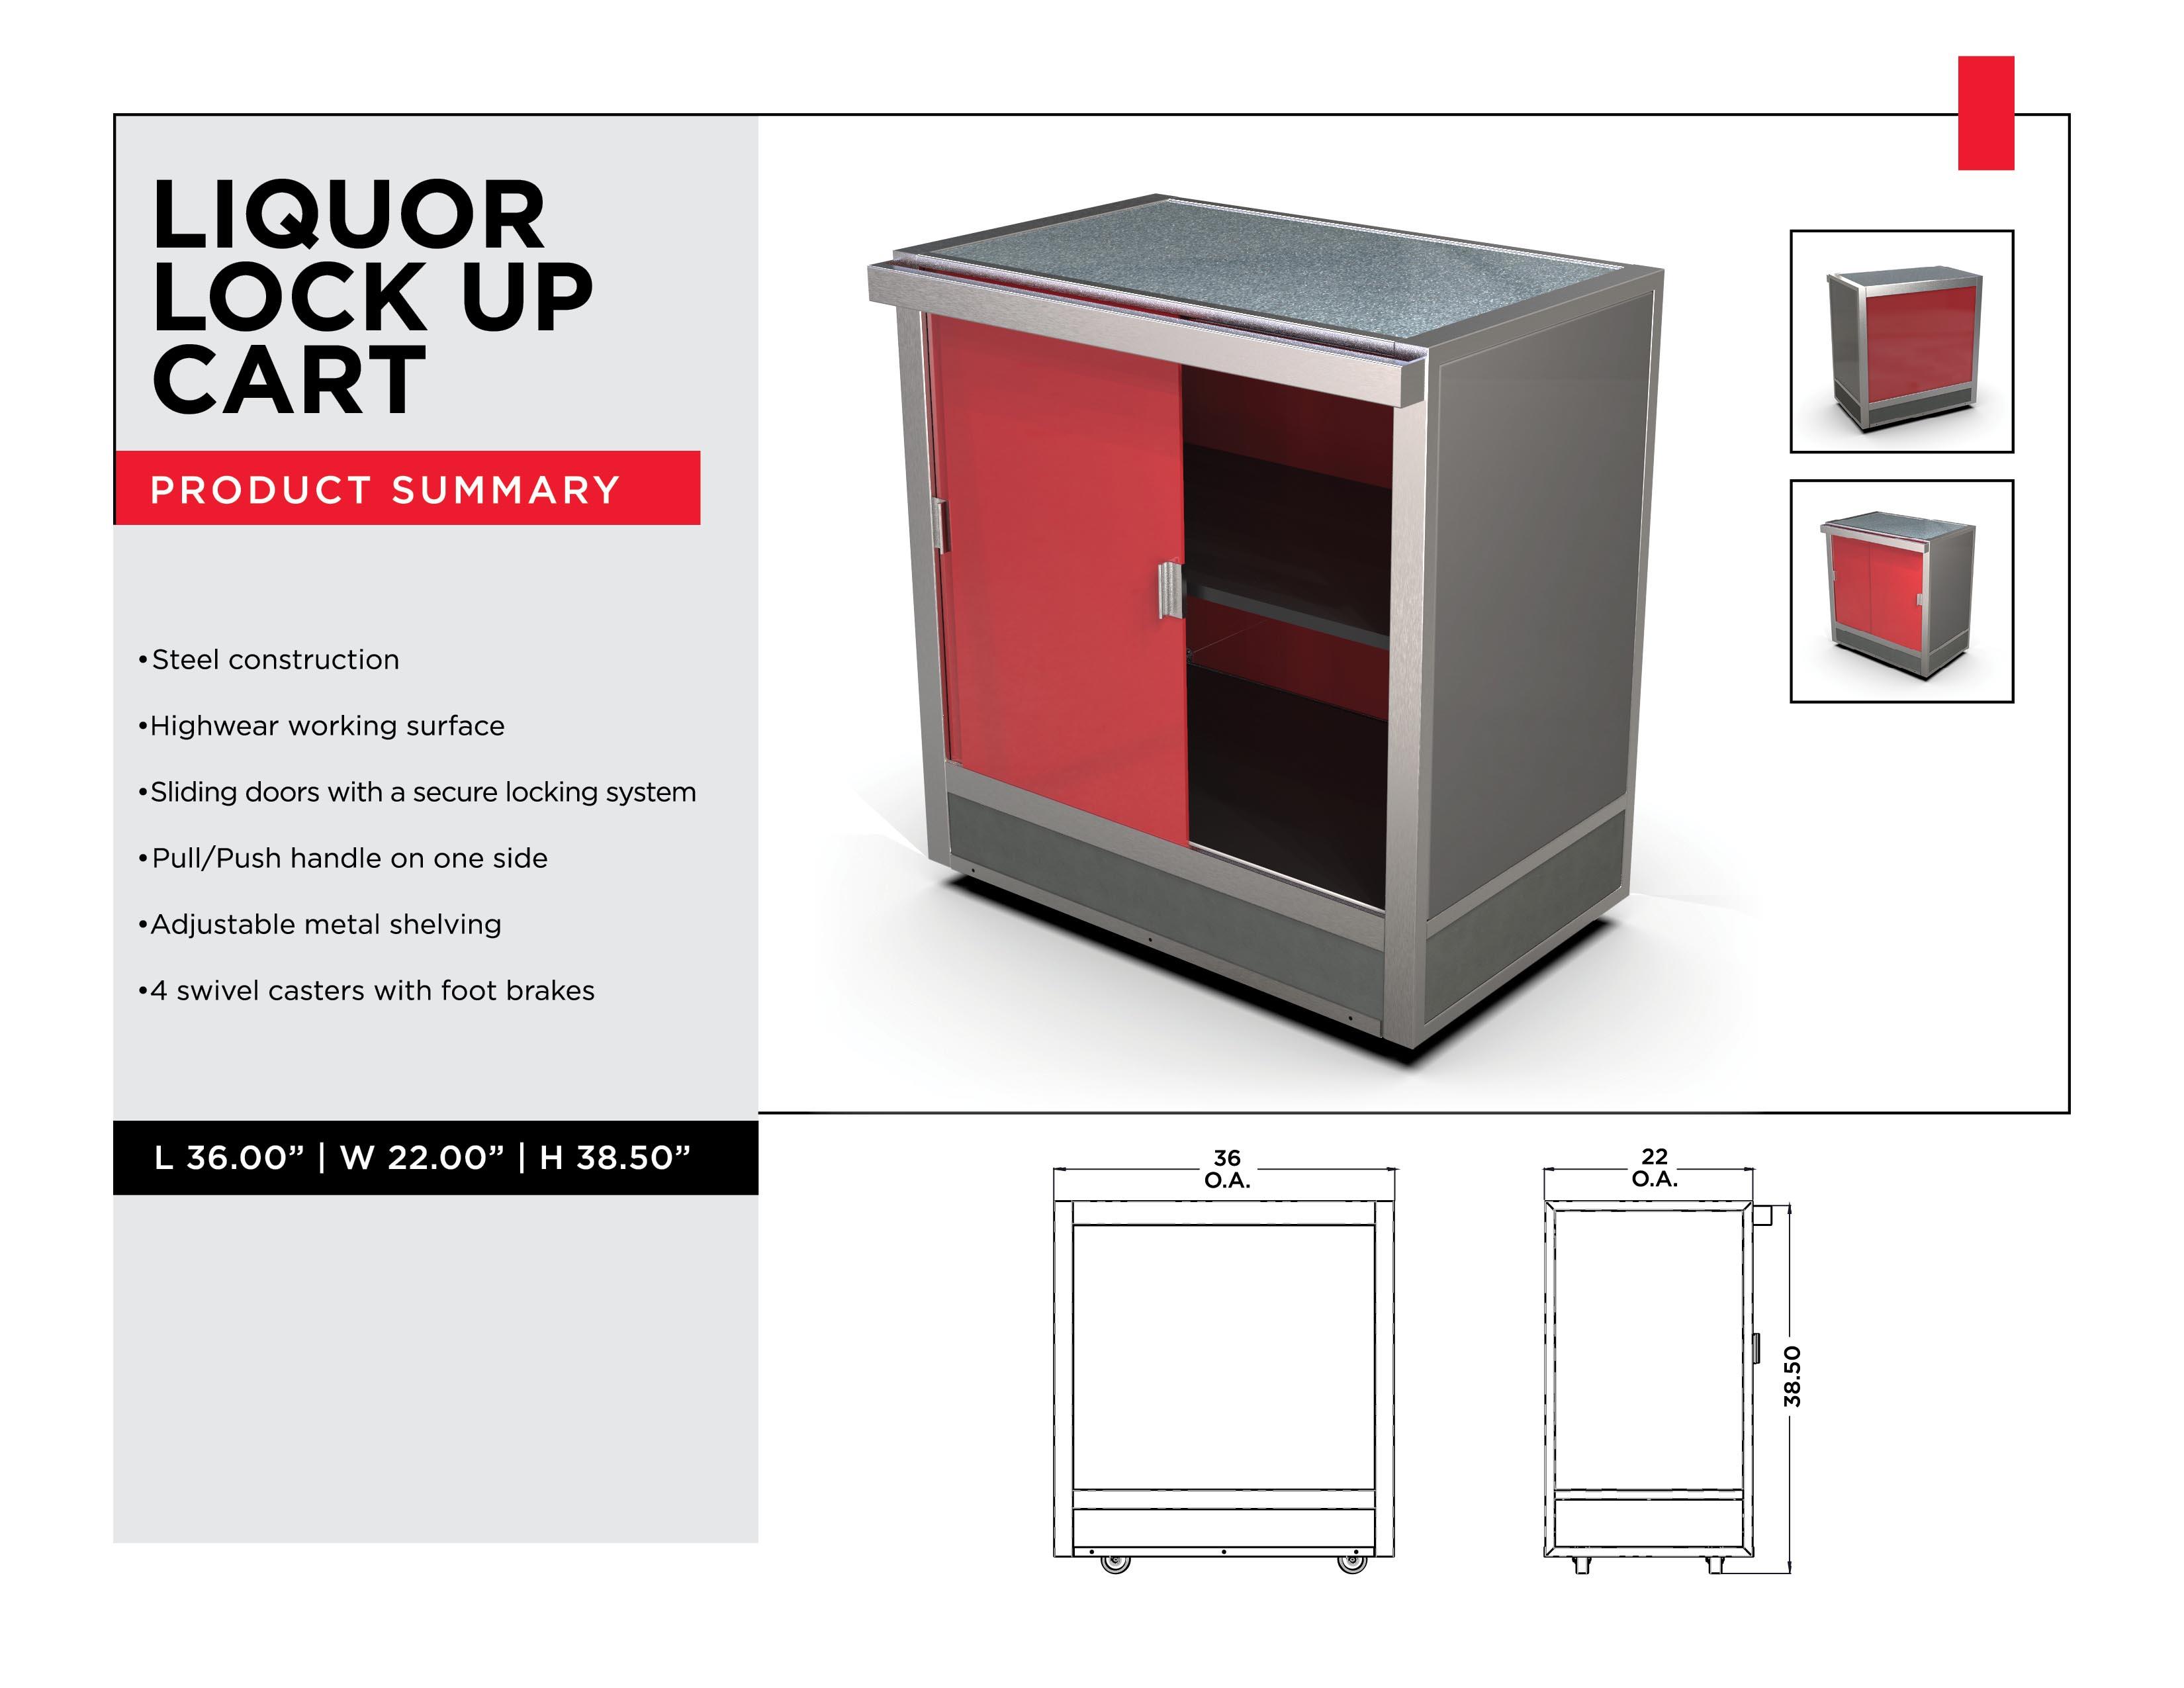 Retail Display Solutions: Liquor Lock Up Cart